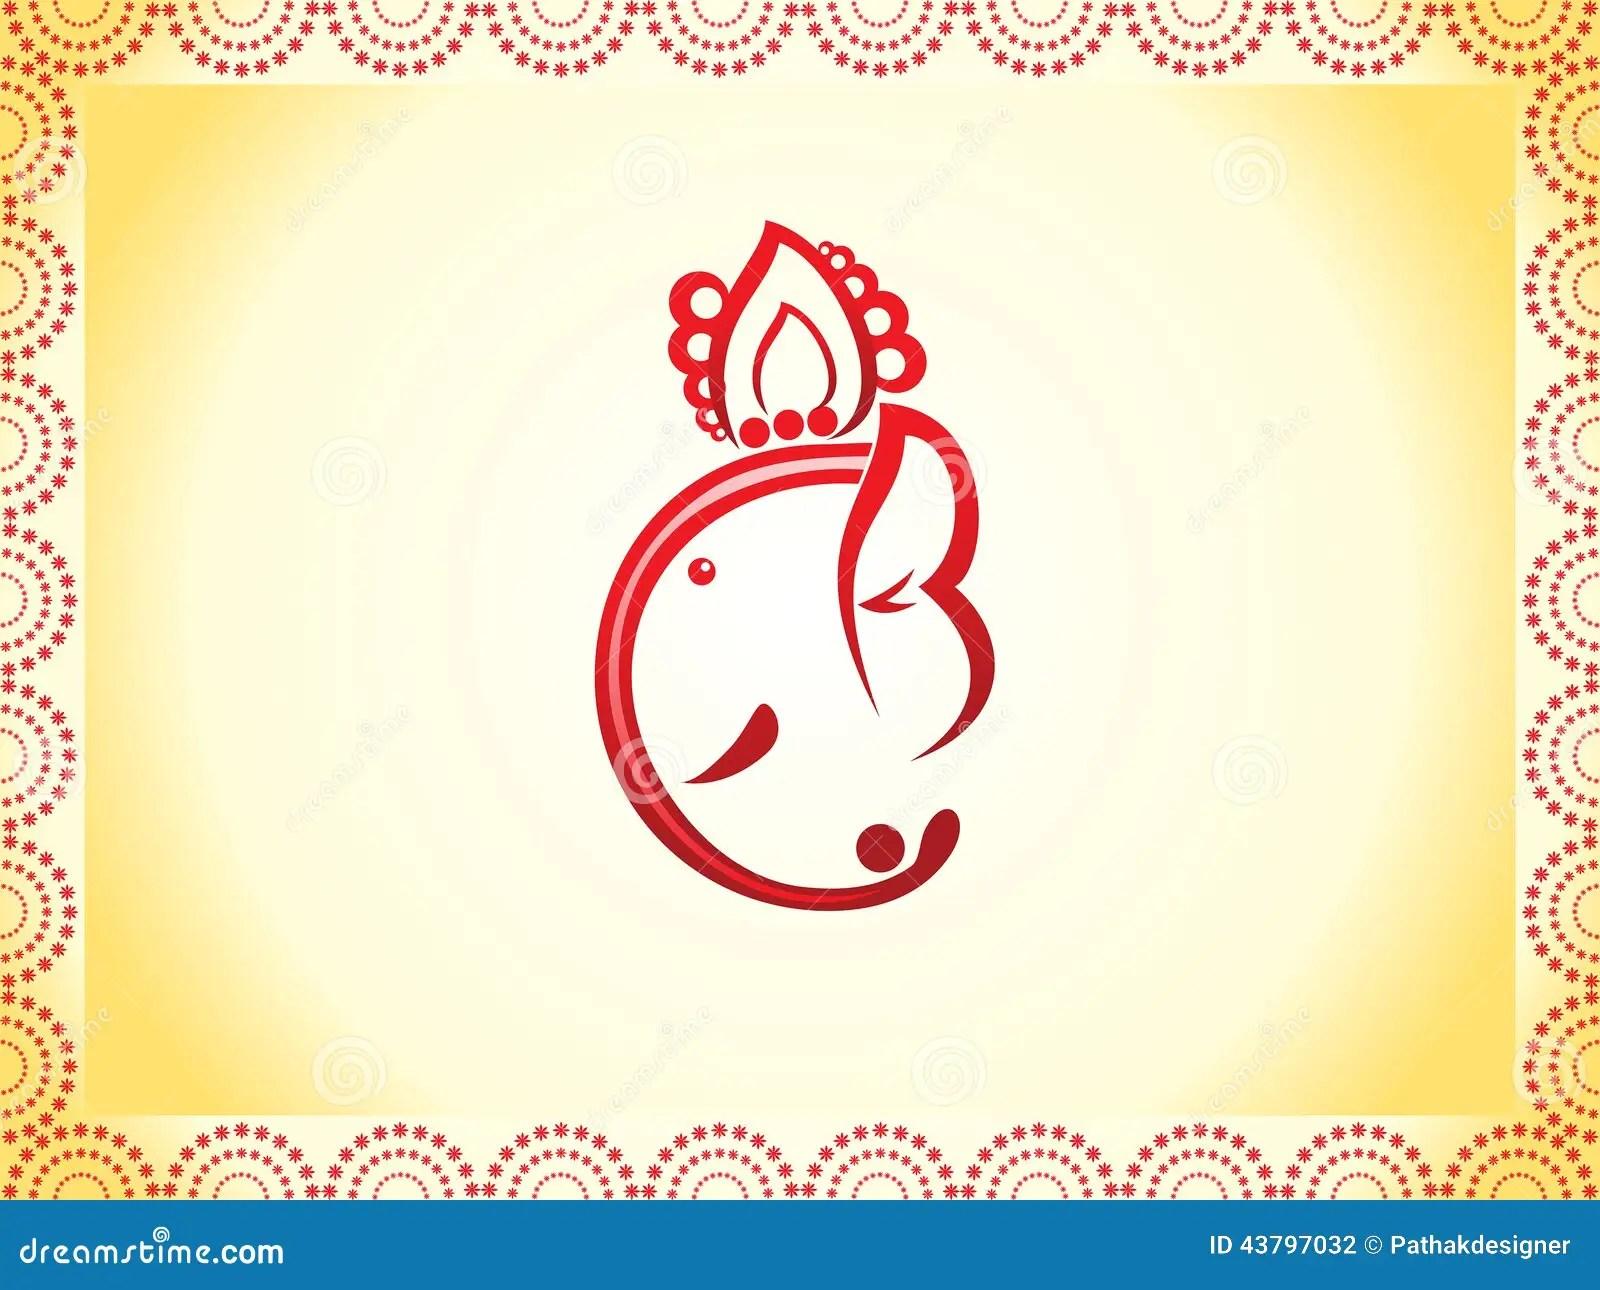 Vinayaka Chavithi Hd Wallpapers Abstract Ganesha Chaturthi Background Stock Vector